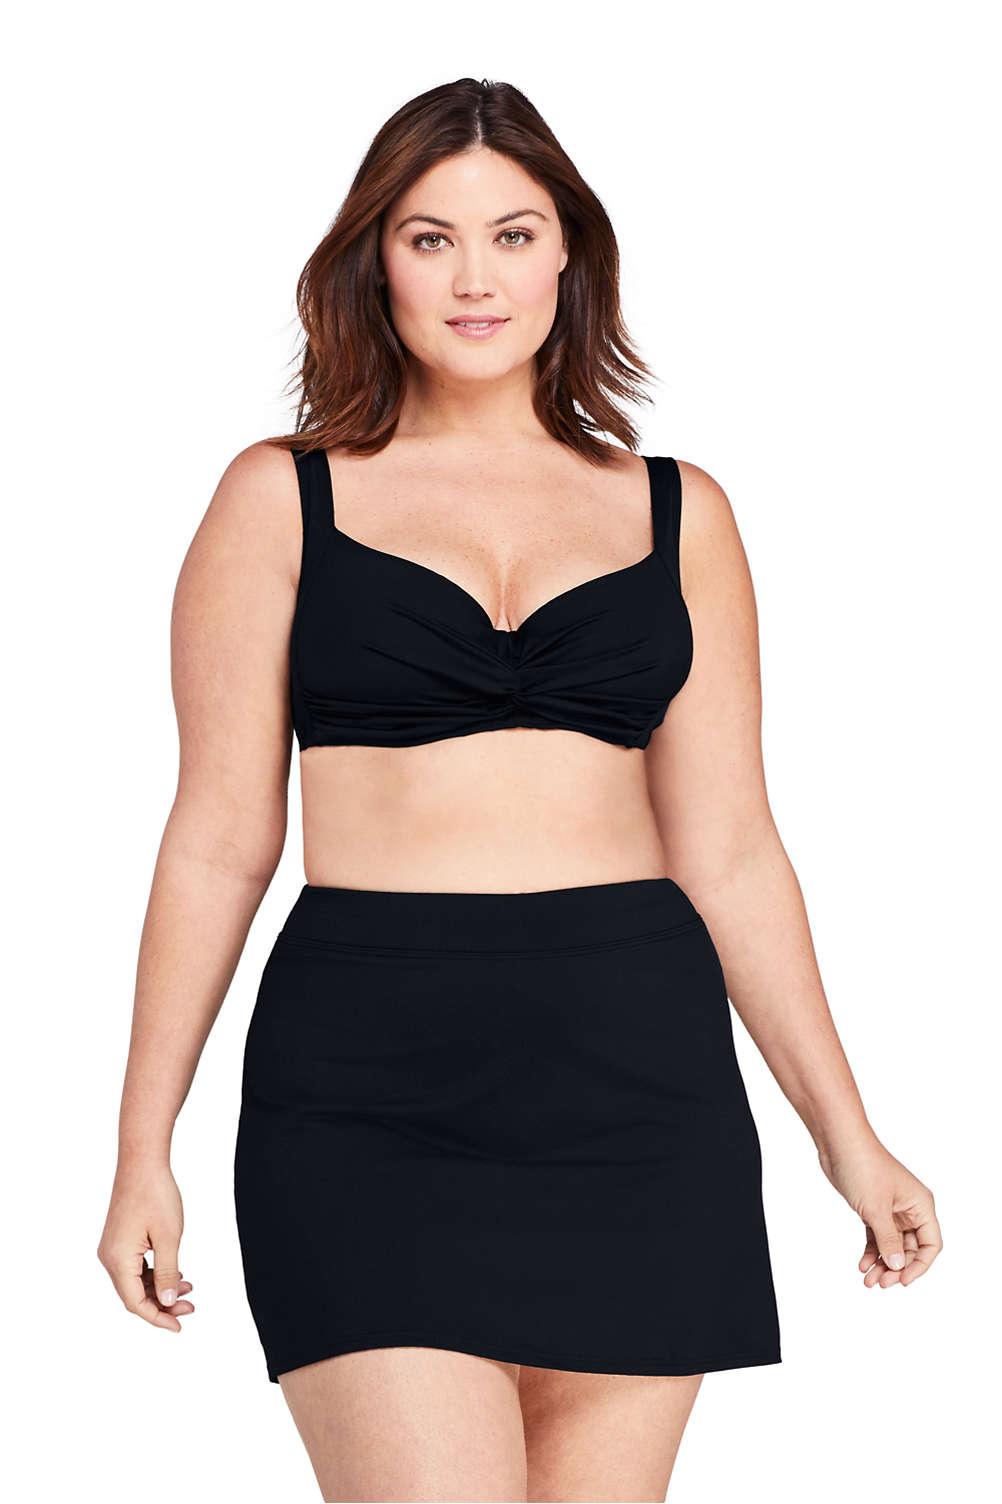 f722a115583 Women's Plus Size Twist Front Underwire Bikini Top Swimsuit from Lands' End